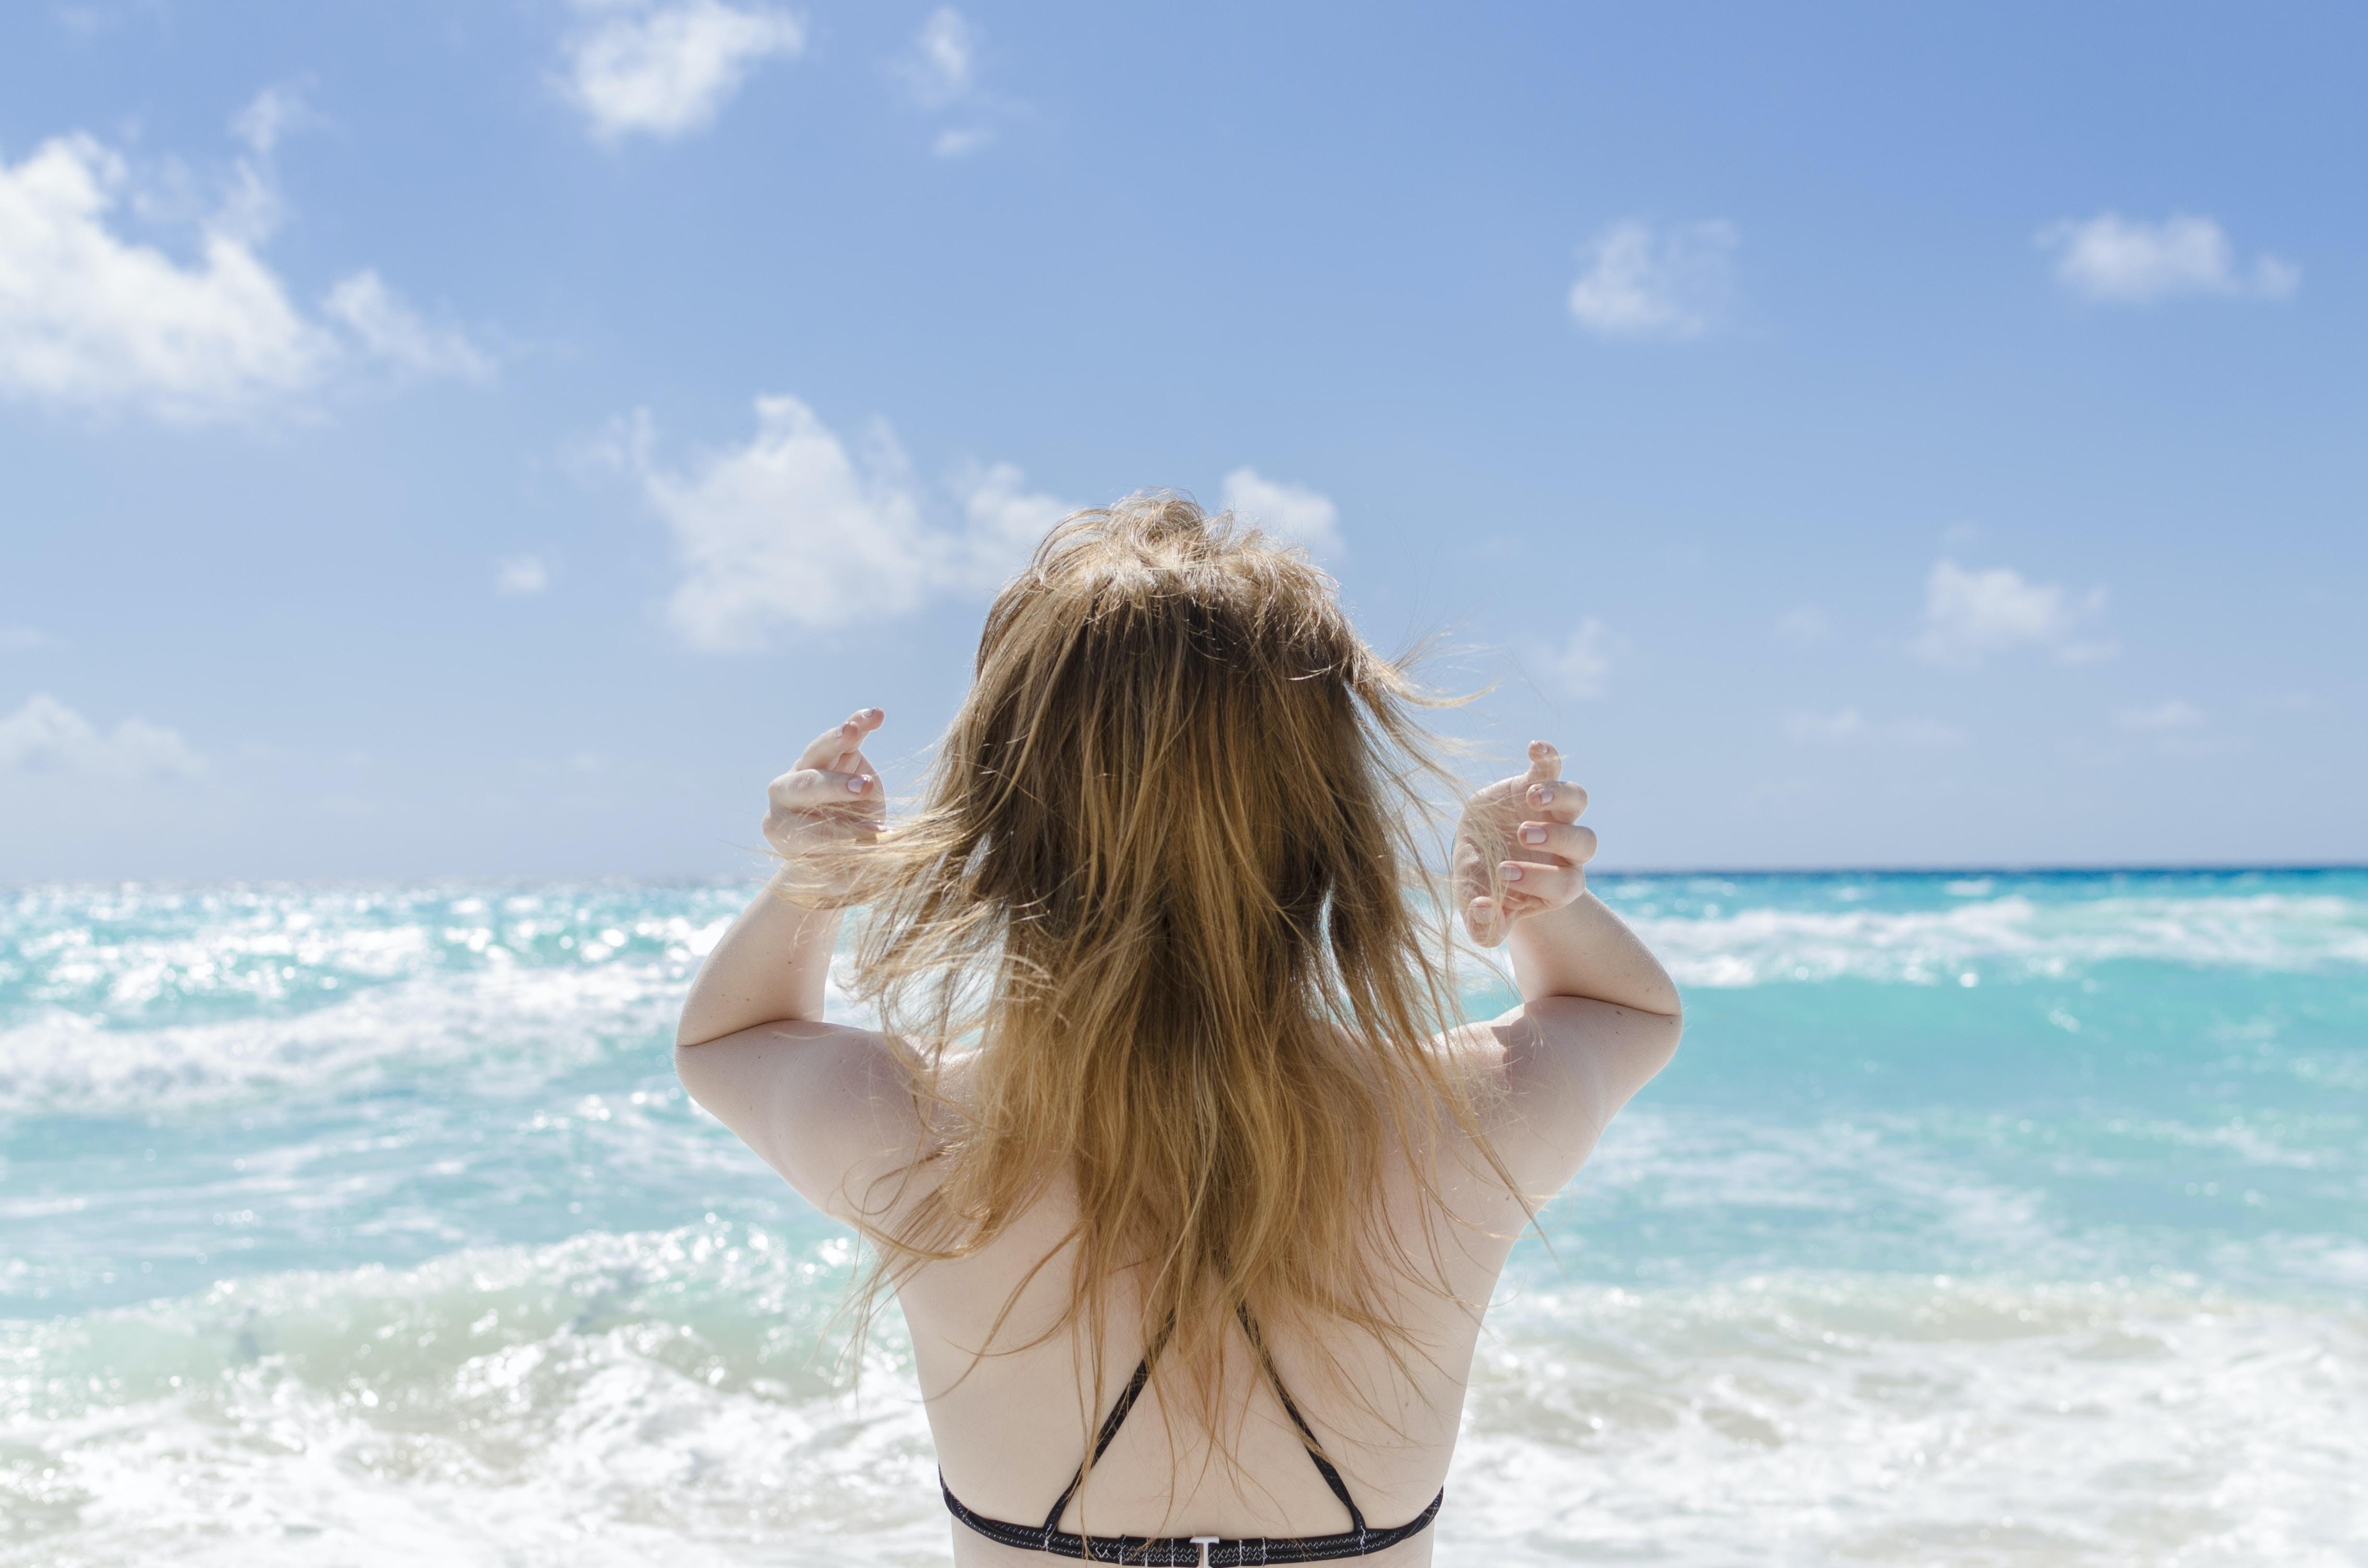 woman wearing black bra raising both arms facing towards the sea at daytime